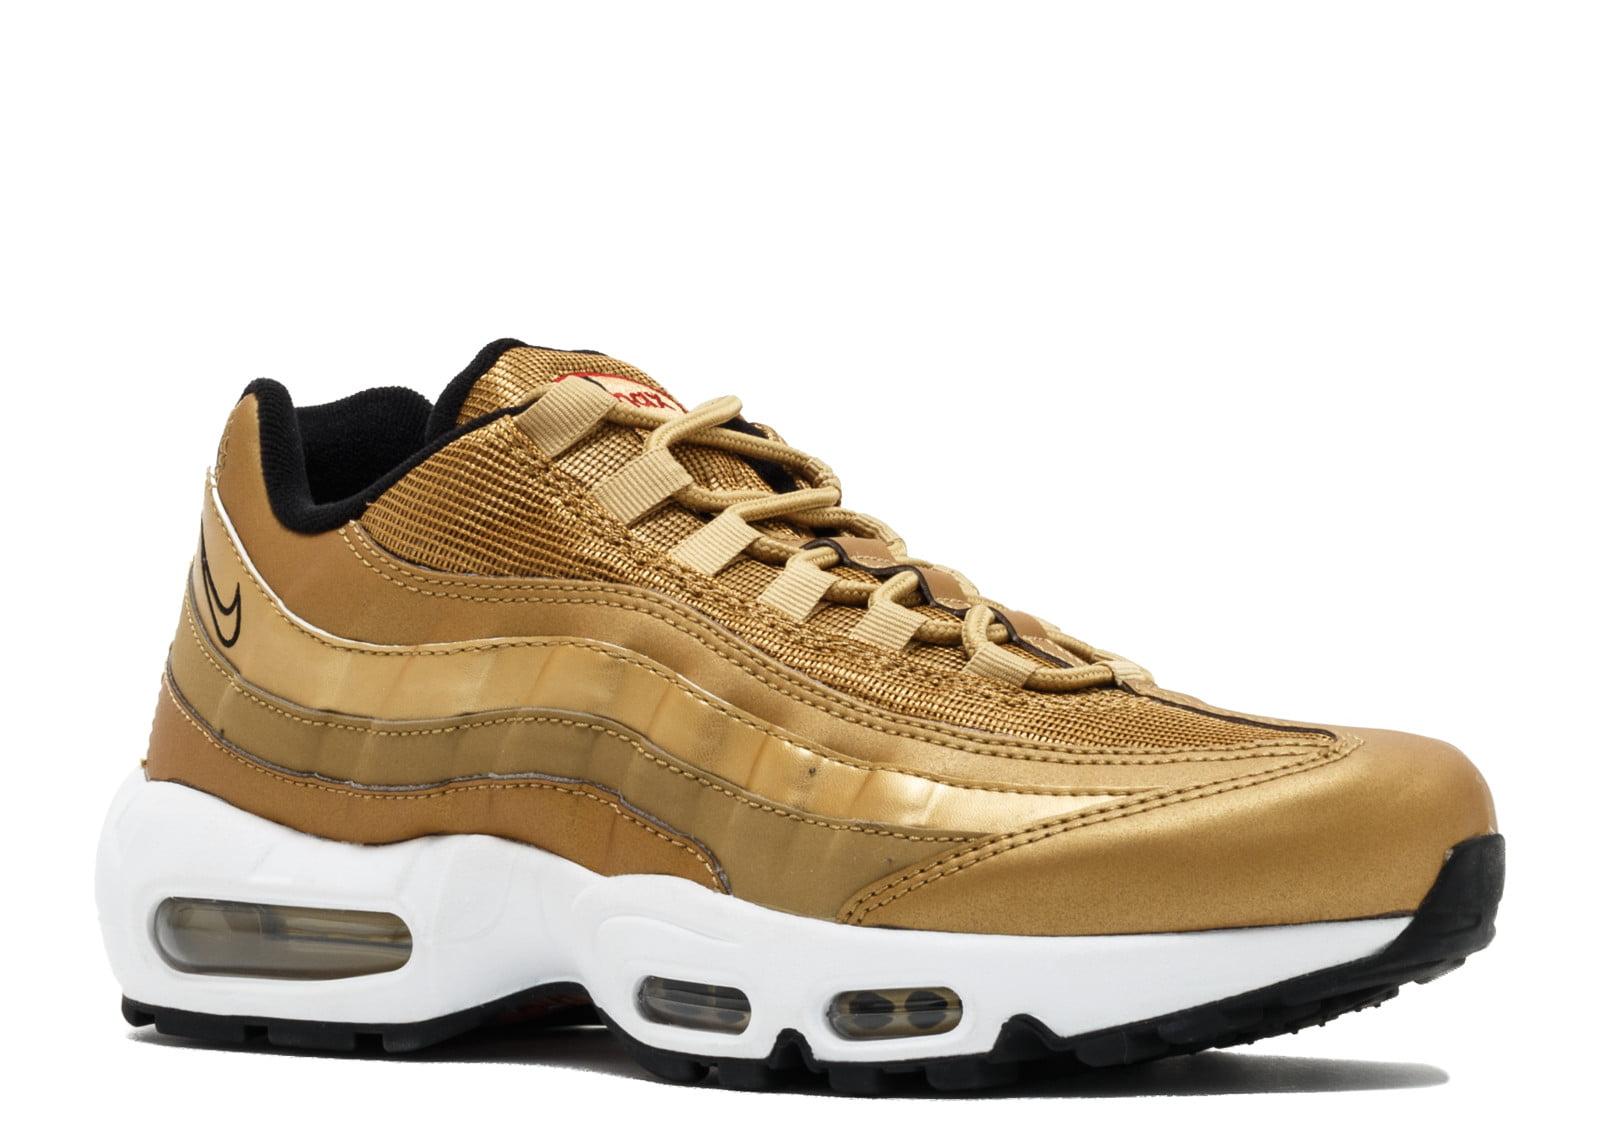 buy online e4f83 1f132 Nike - Men - Air Max 95 Premium Qs - 918359-700 - Size 8